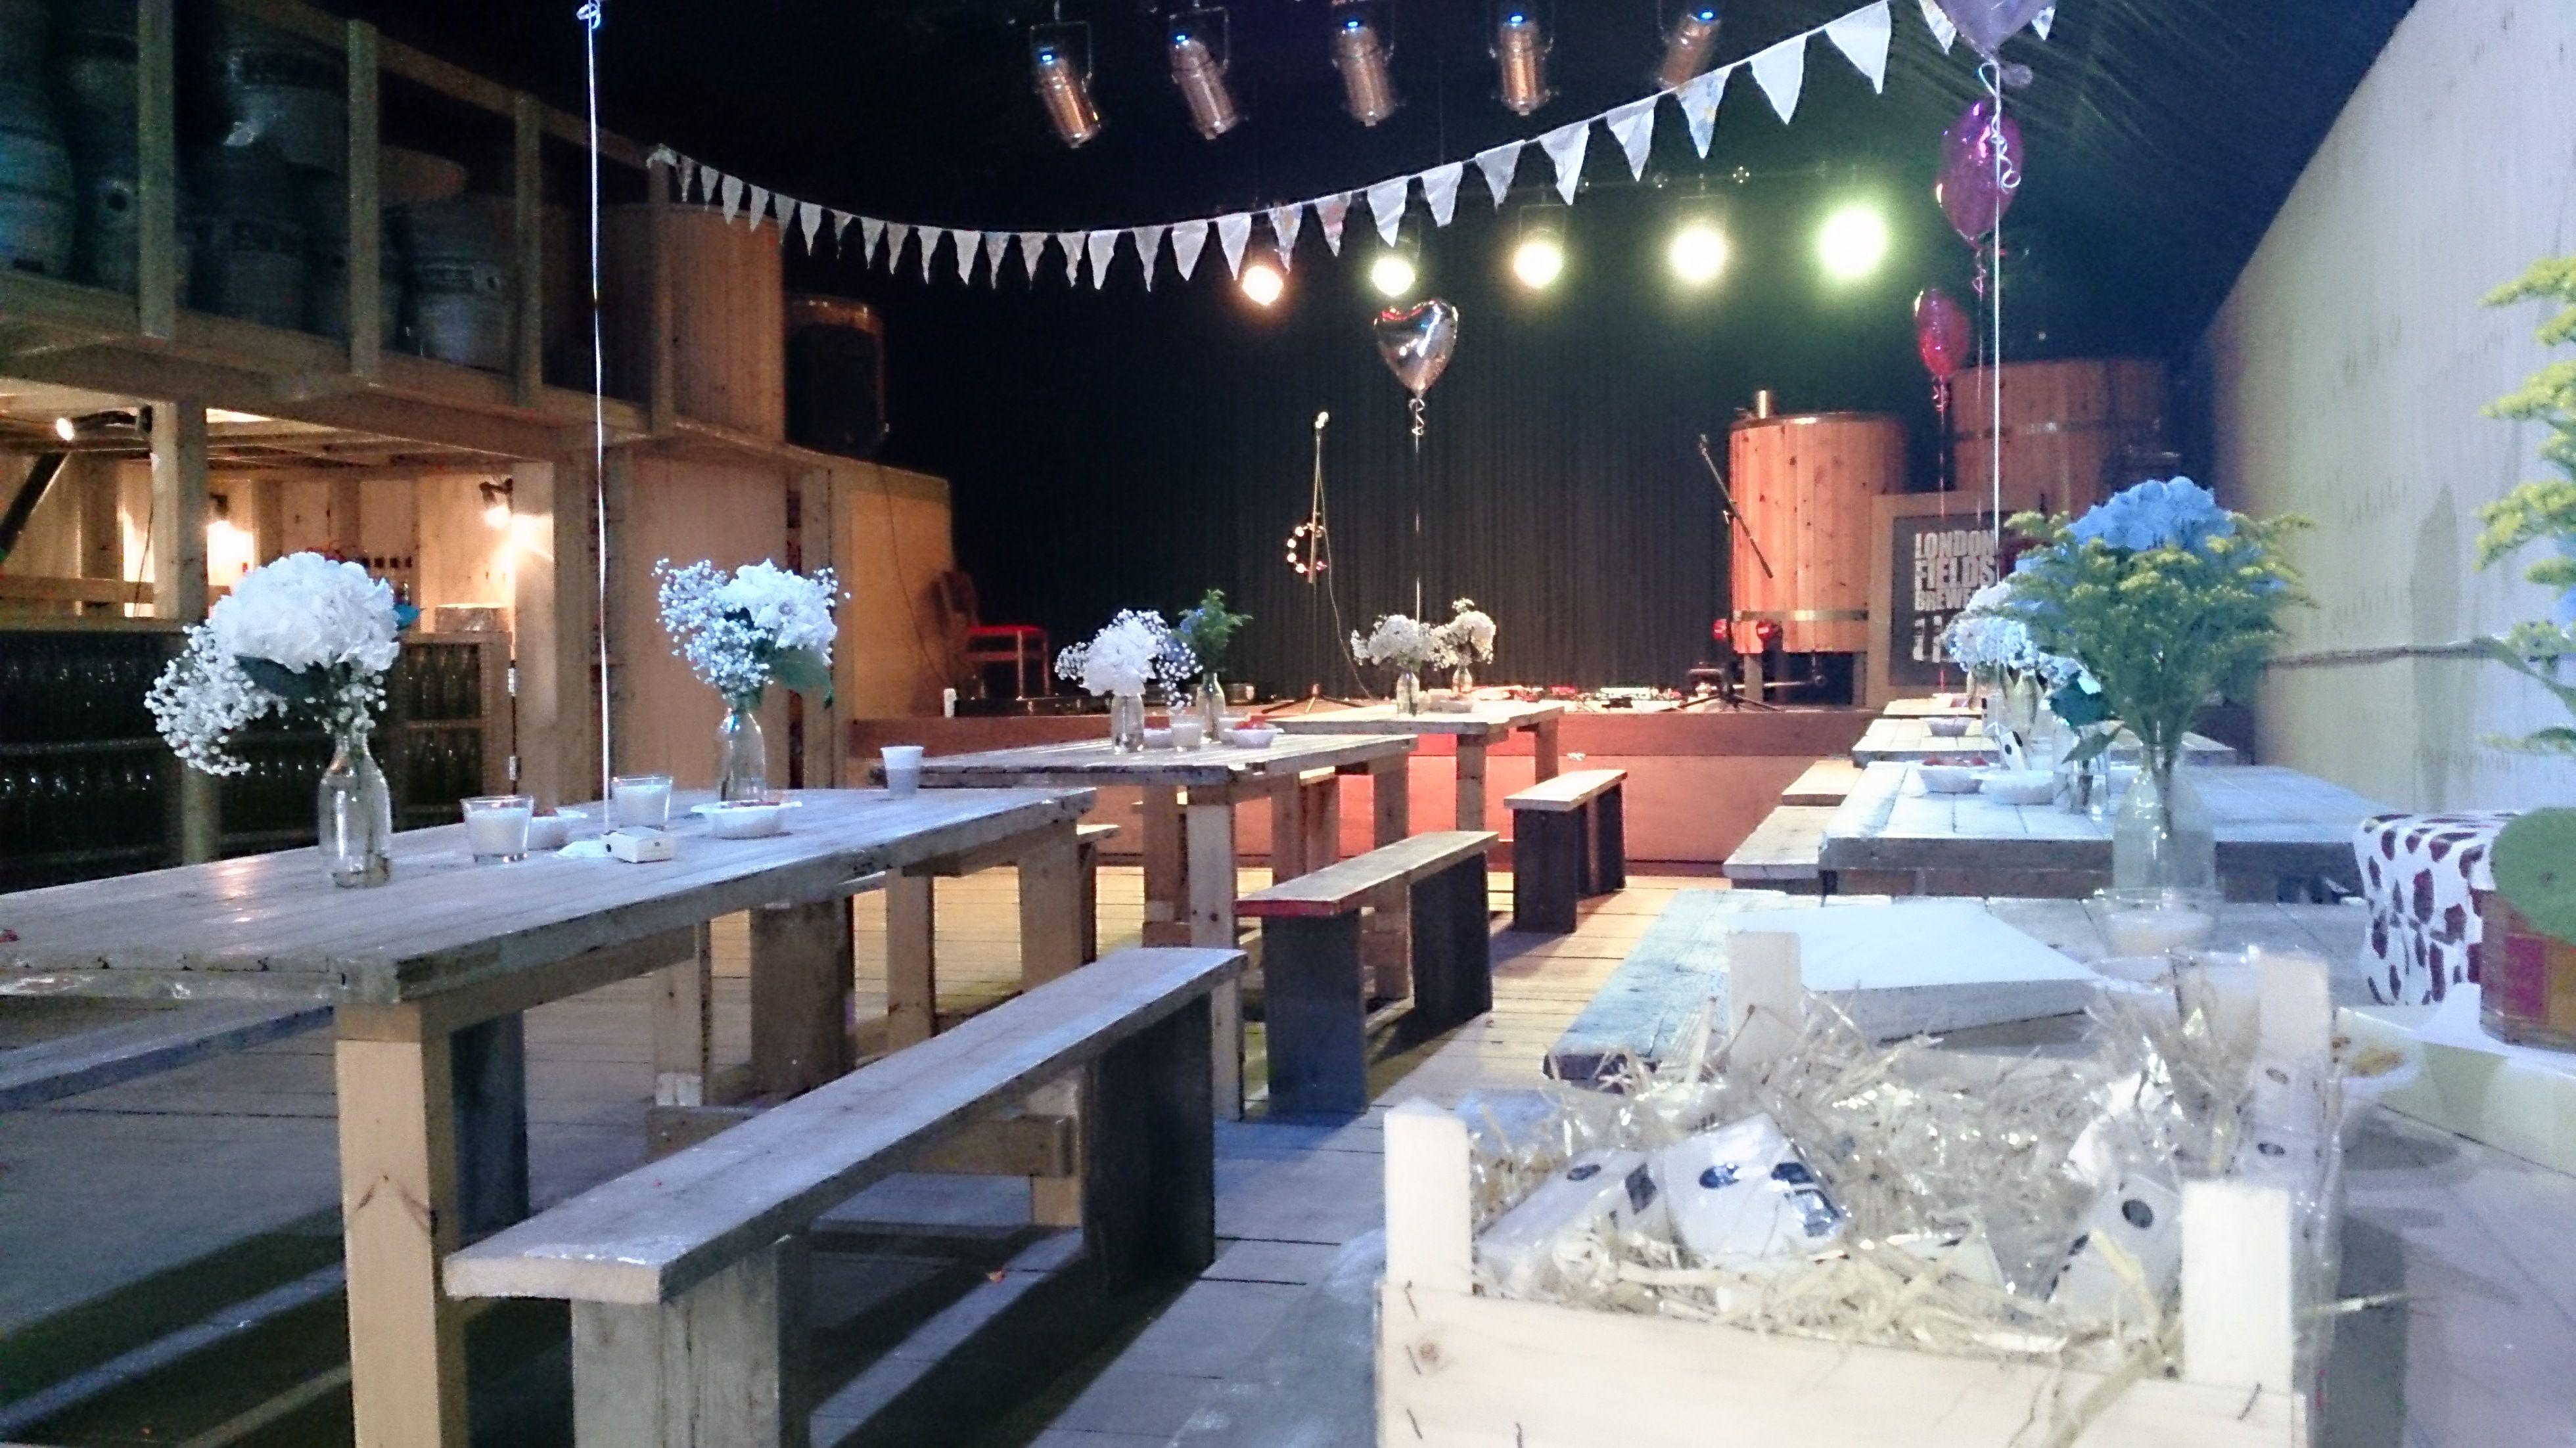 London fields brewery wedding venues